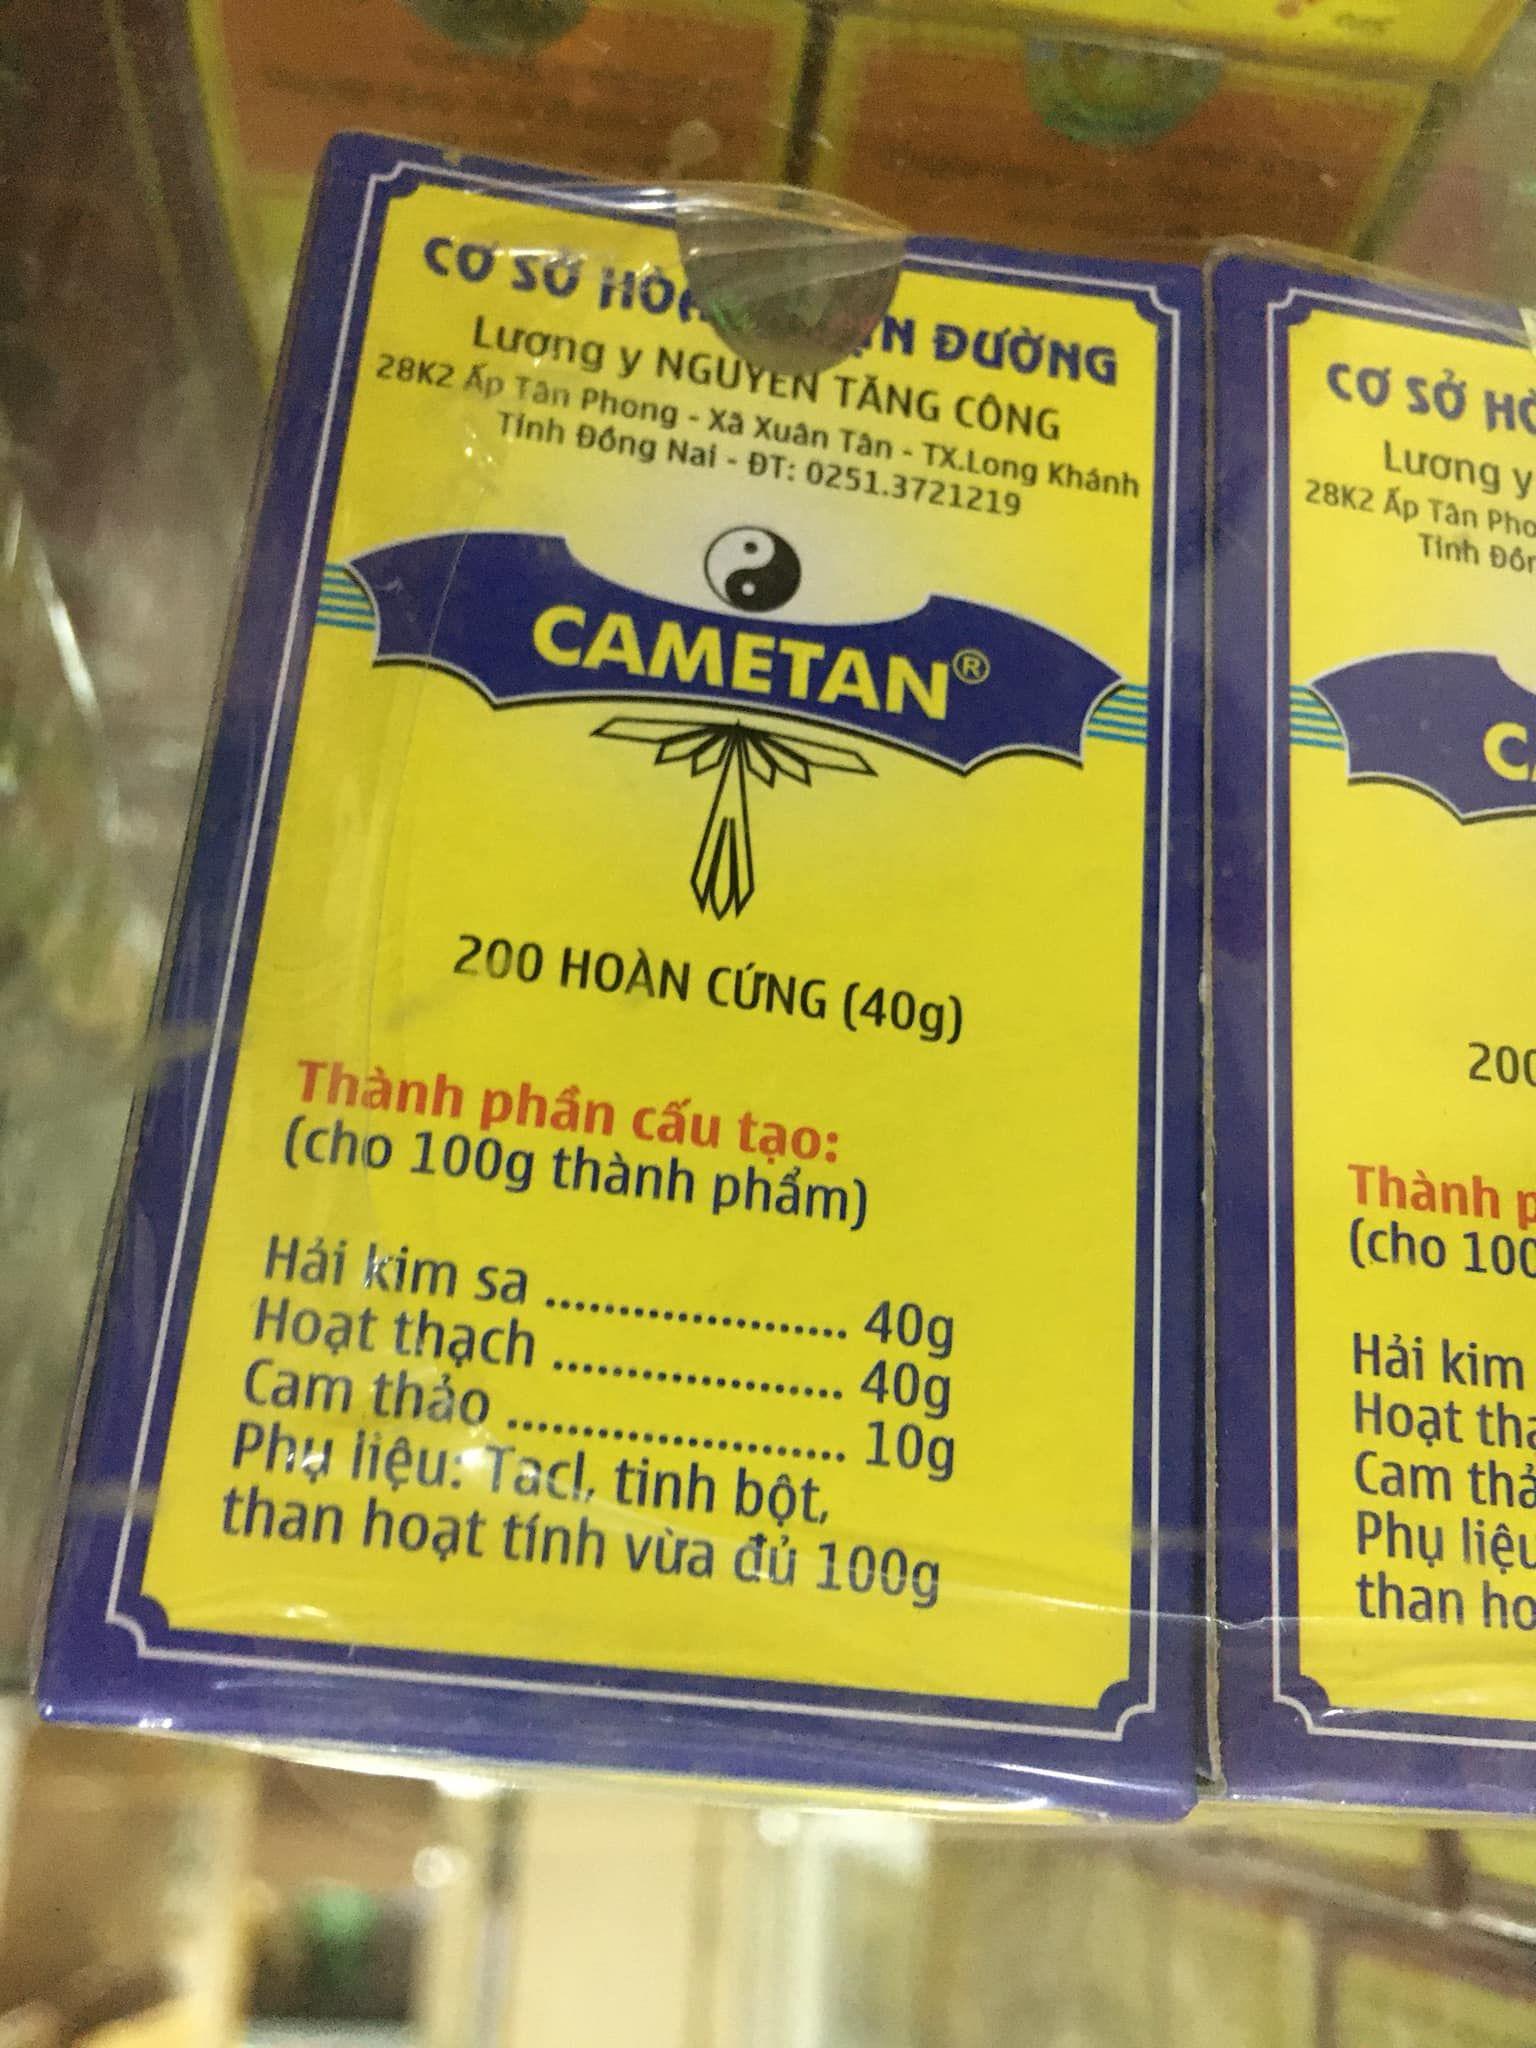 Cametan